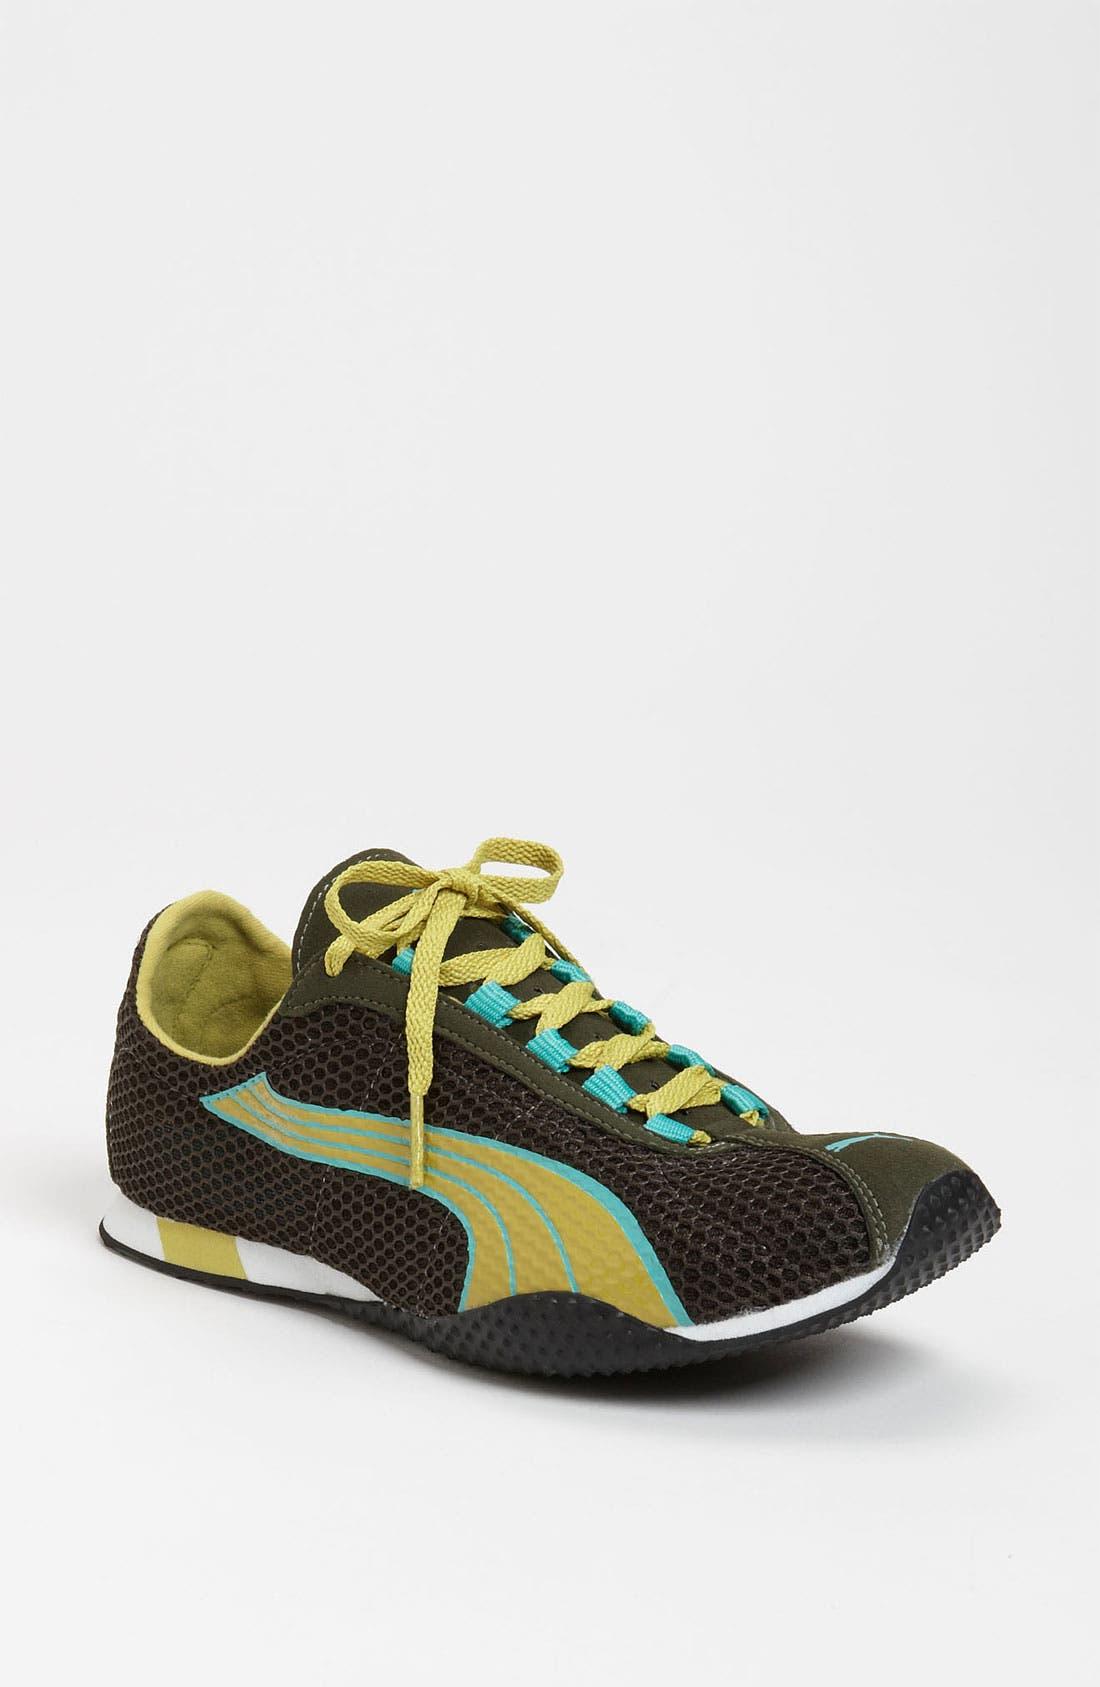 Alternate Image 1 Selected - PUMA 'H Street NM' Active Shoe (Women)